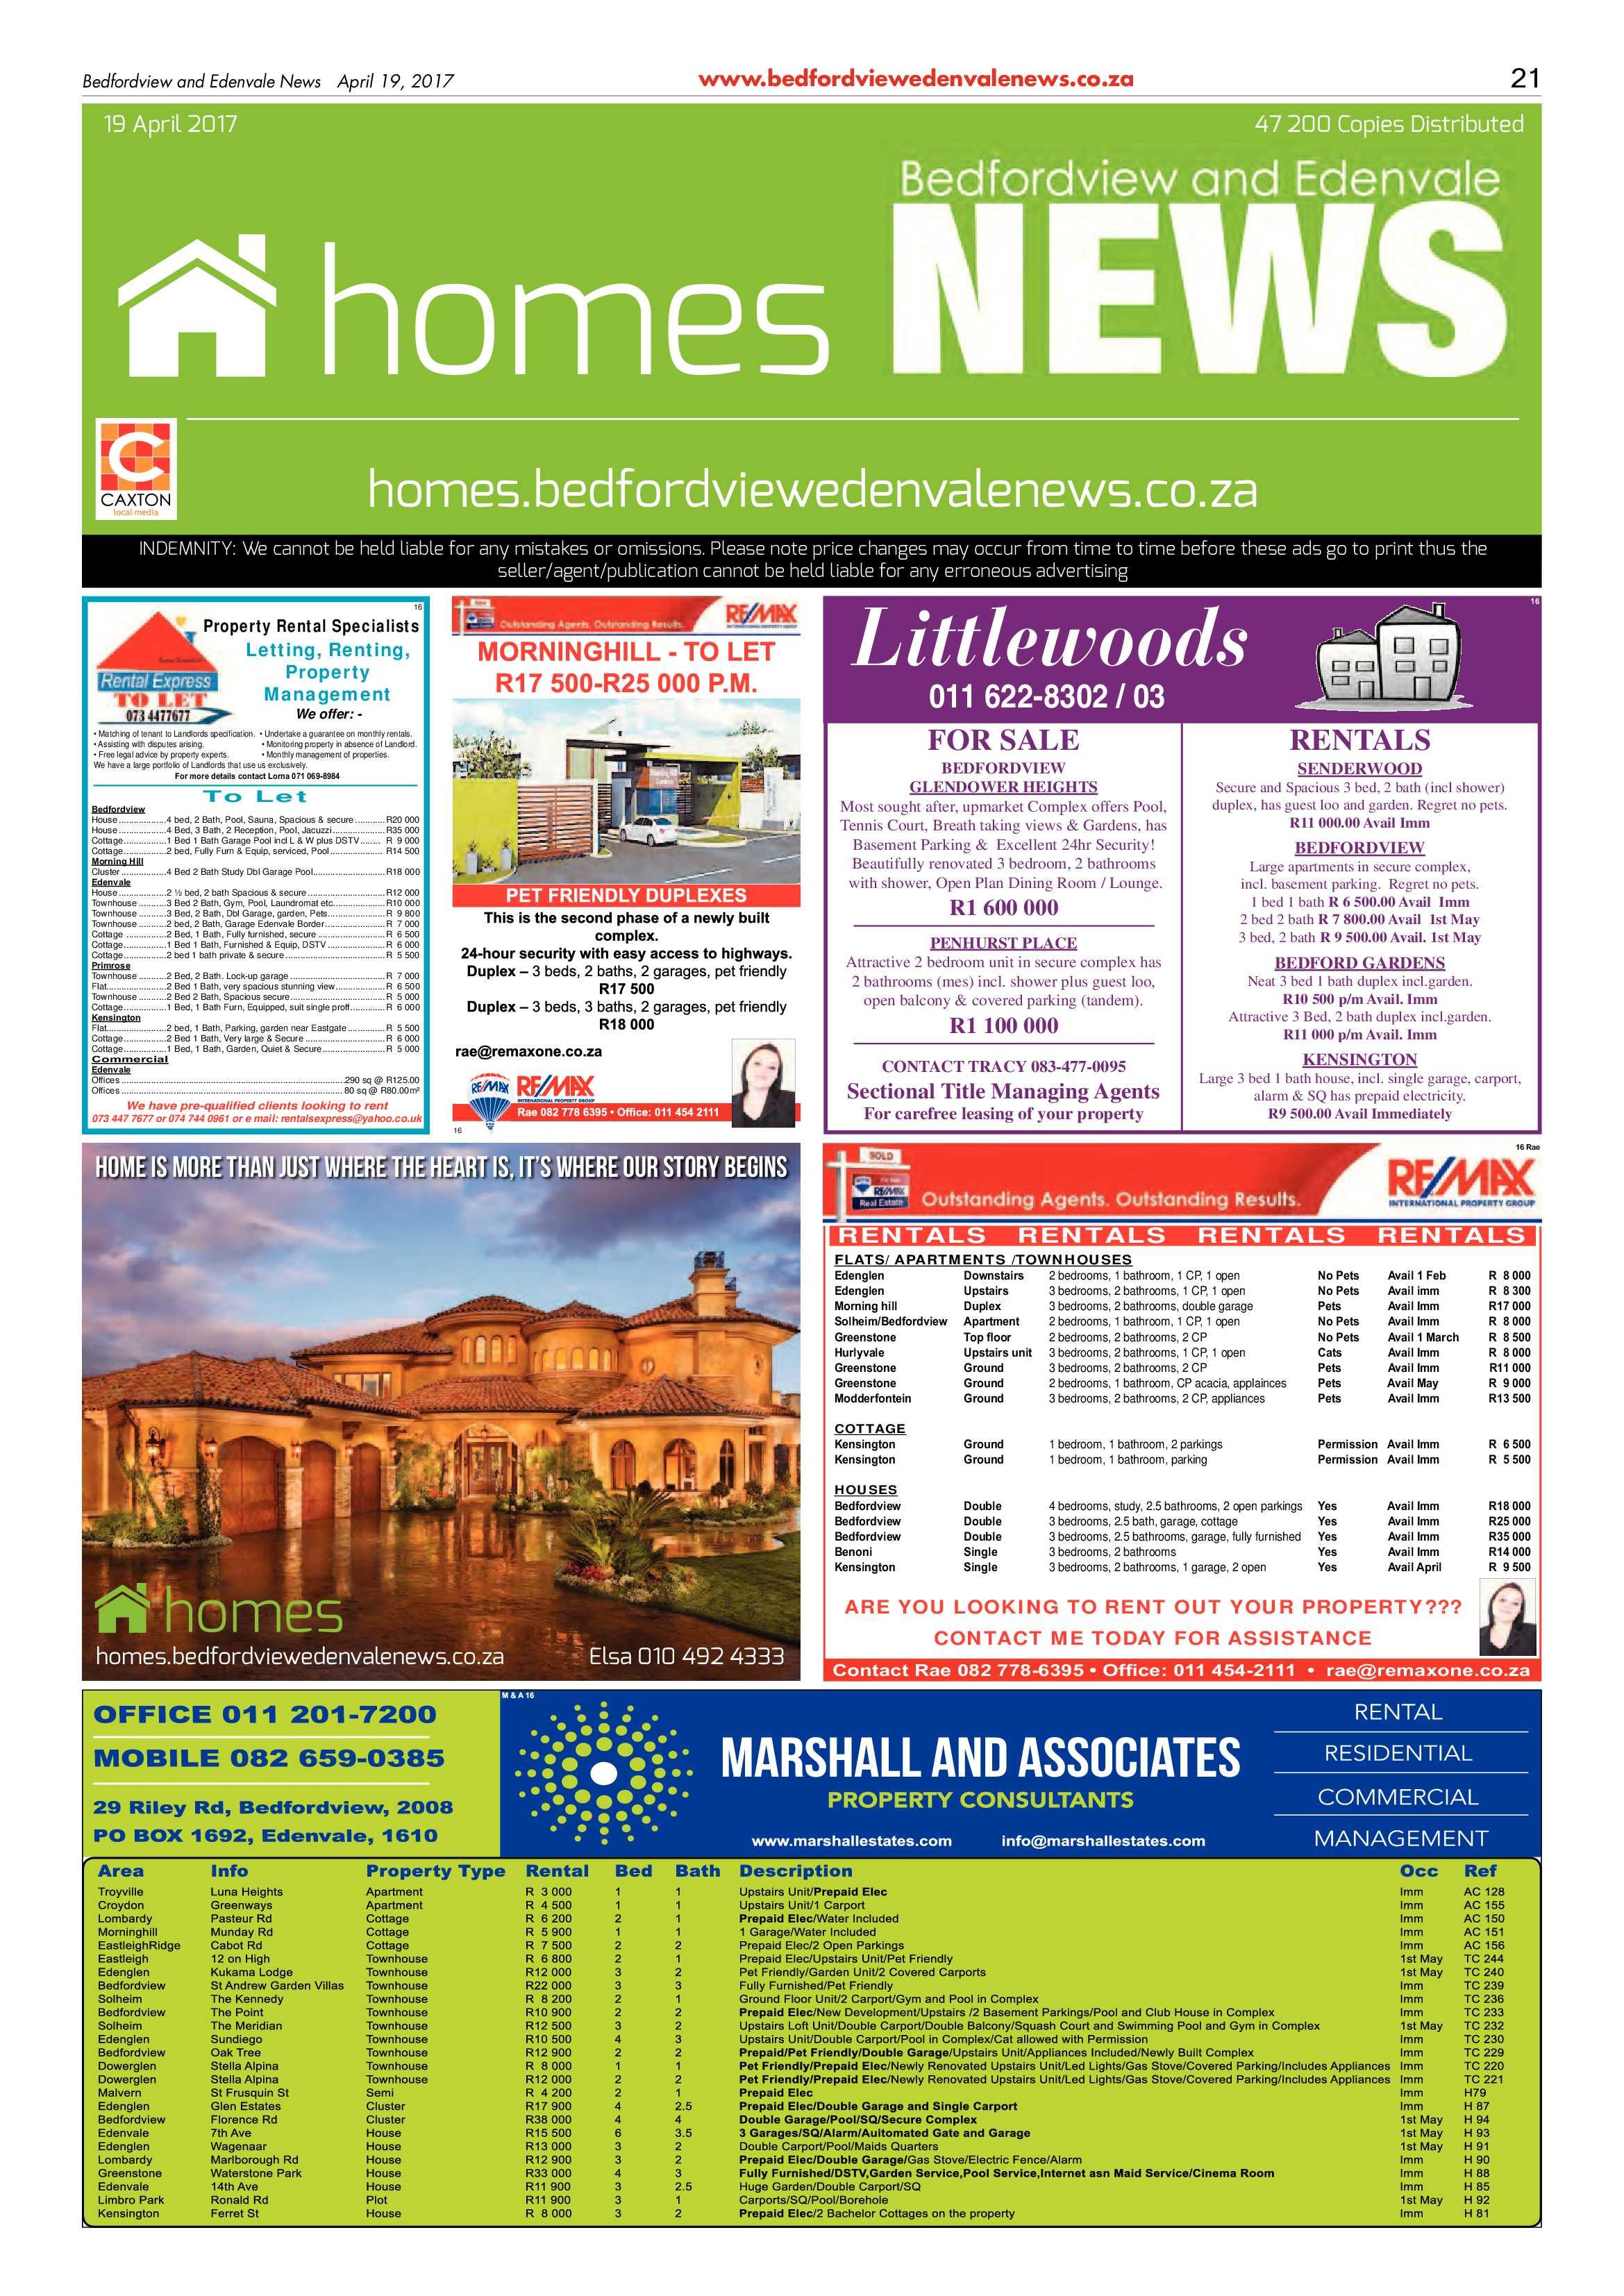 bedfordview-edenvale-news-19-april-2017-epapers-page-21